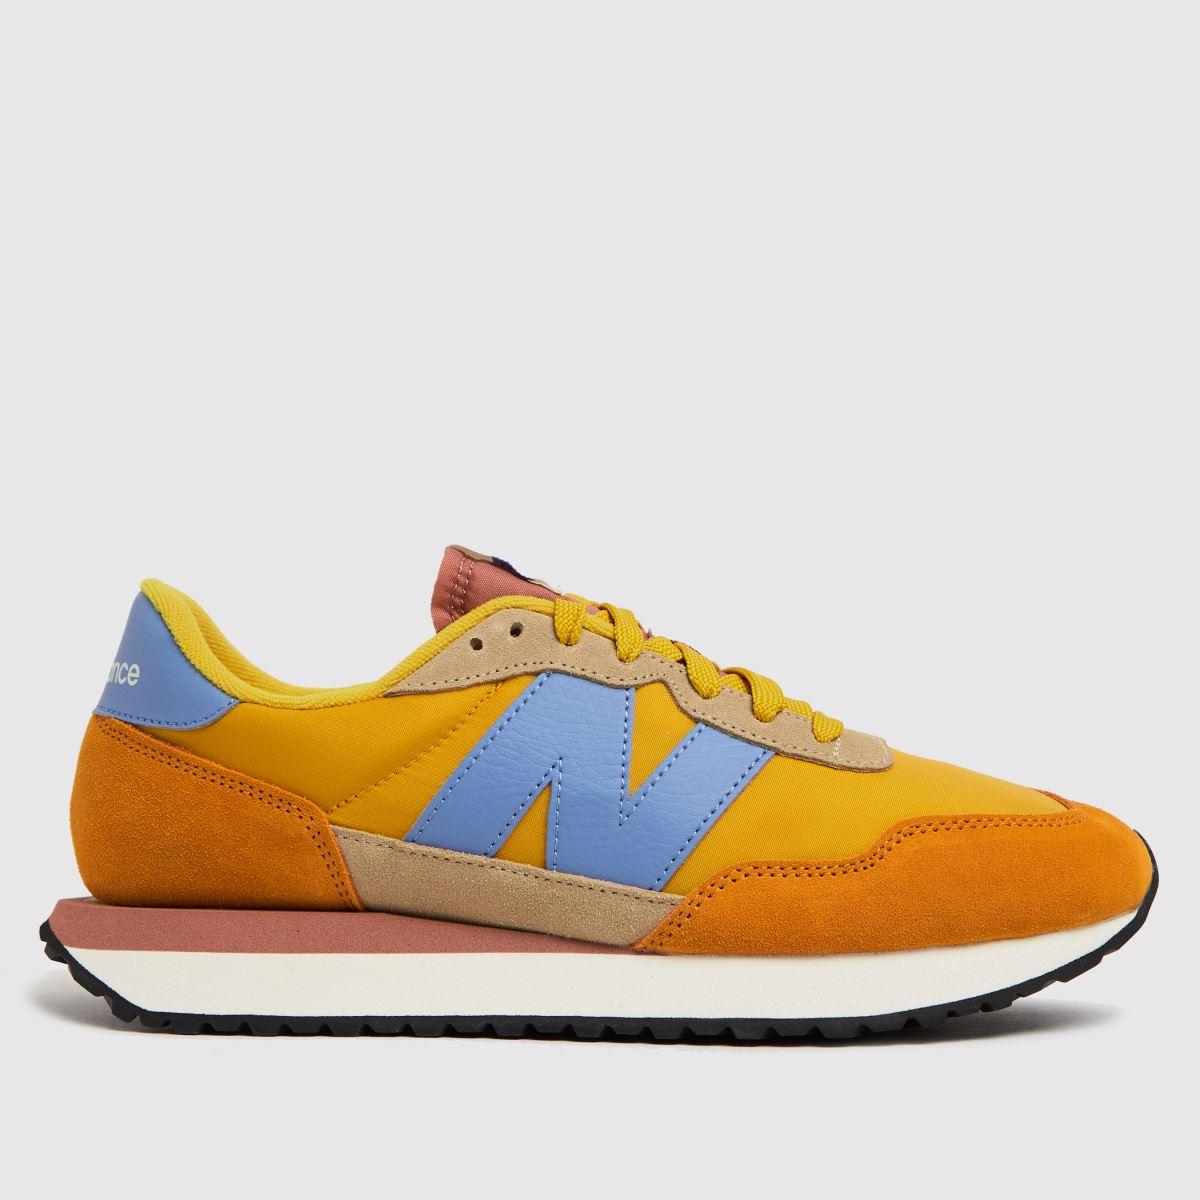 New Balance Yellow 237 Trainers